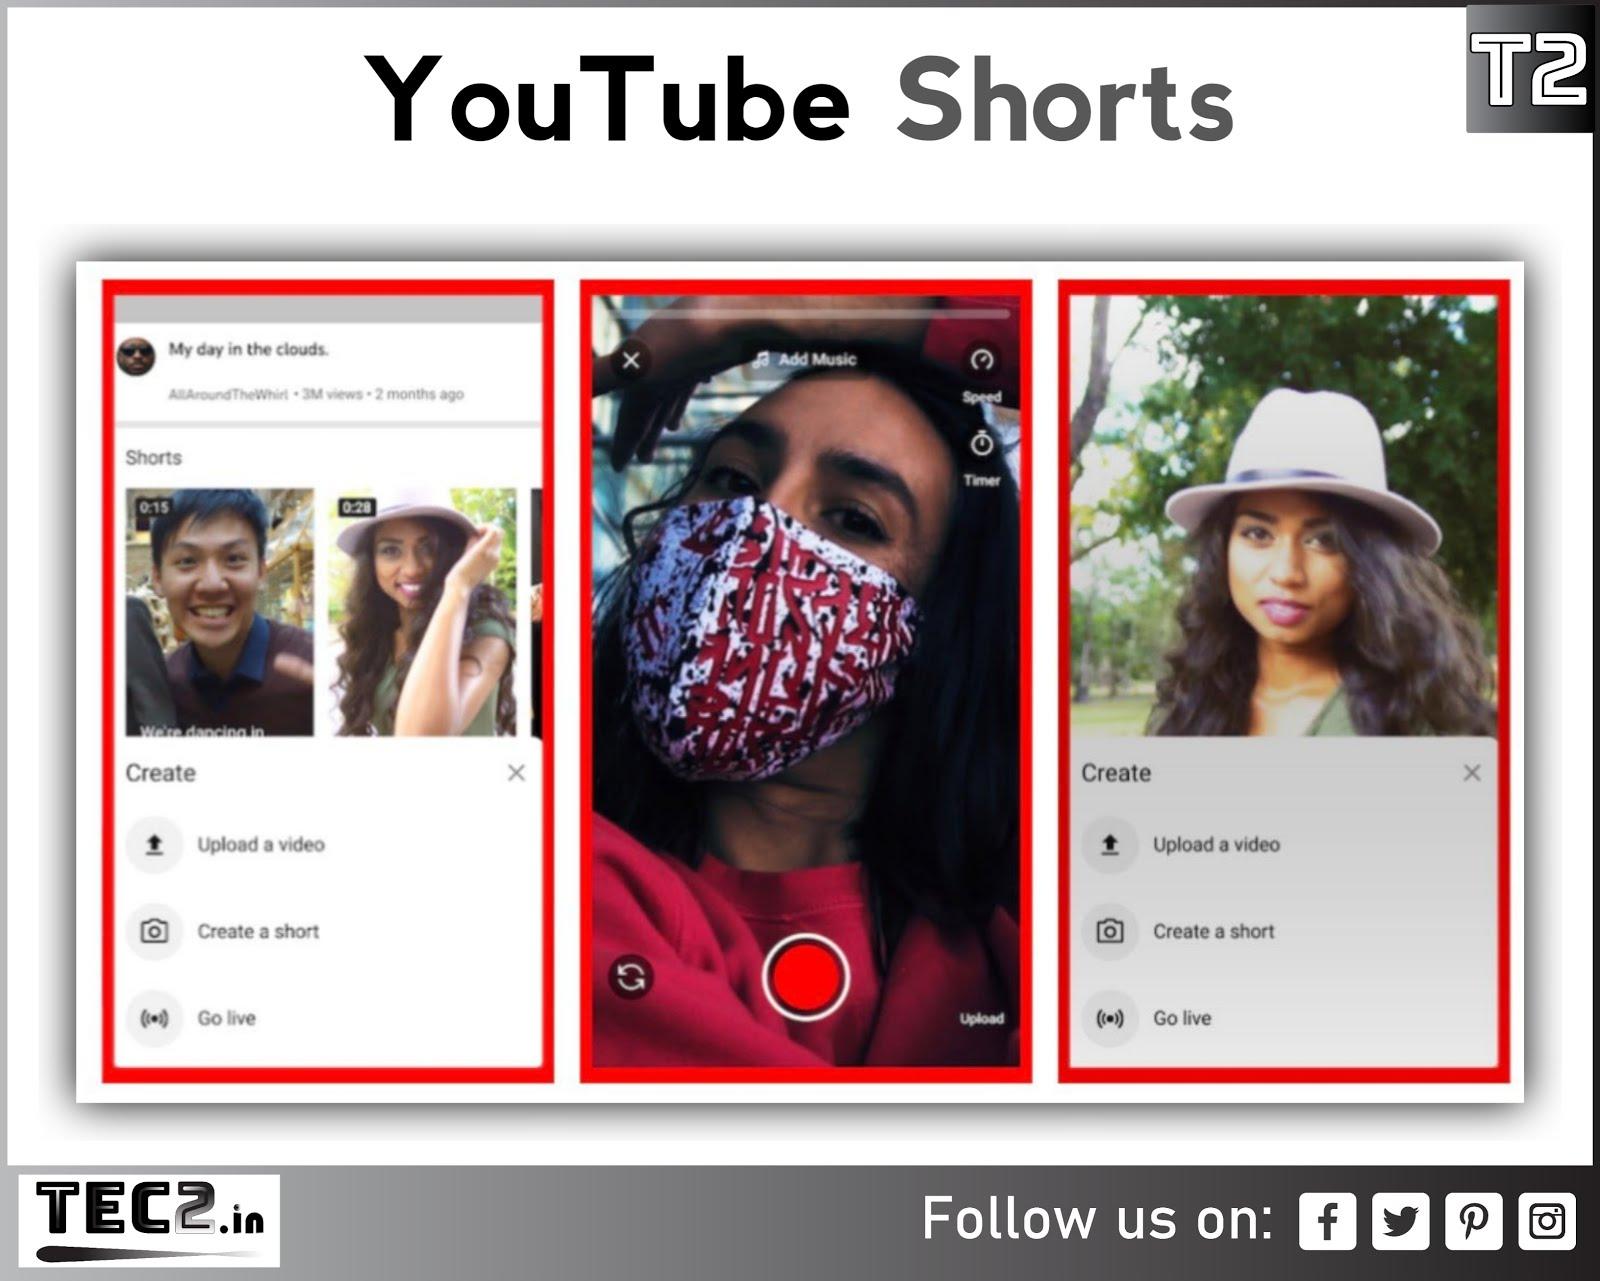 Youtube Shorts - Short Videos App by Google